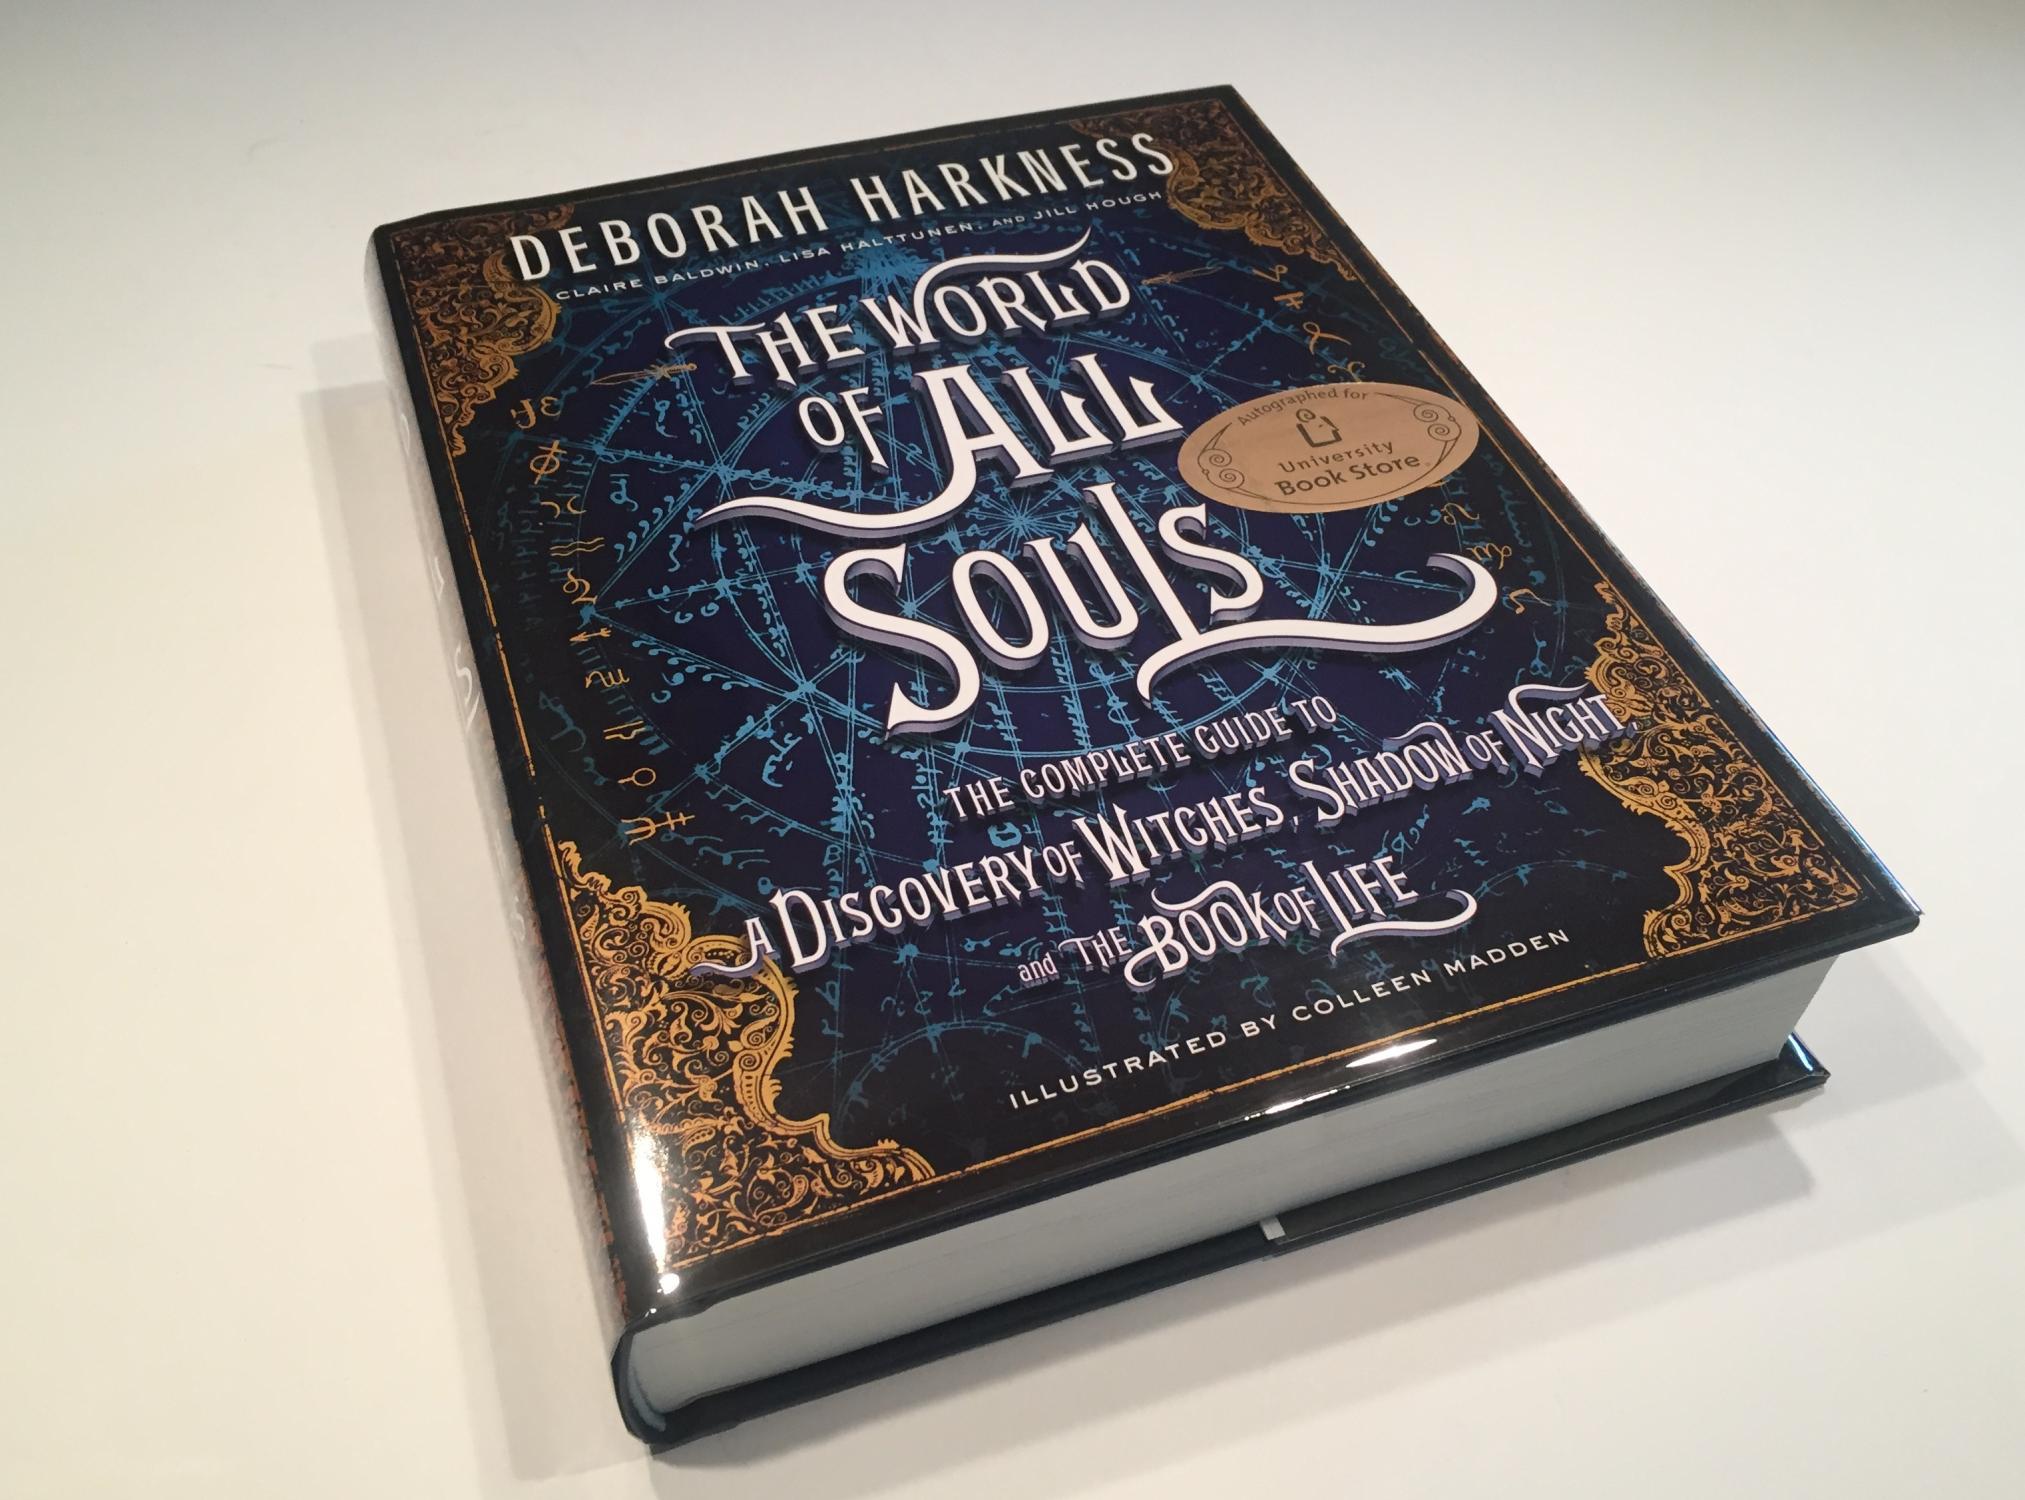 Deborah Harkness Book Of Life